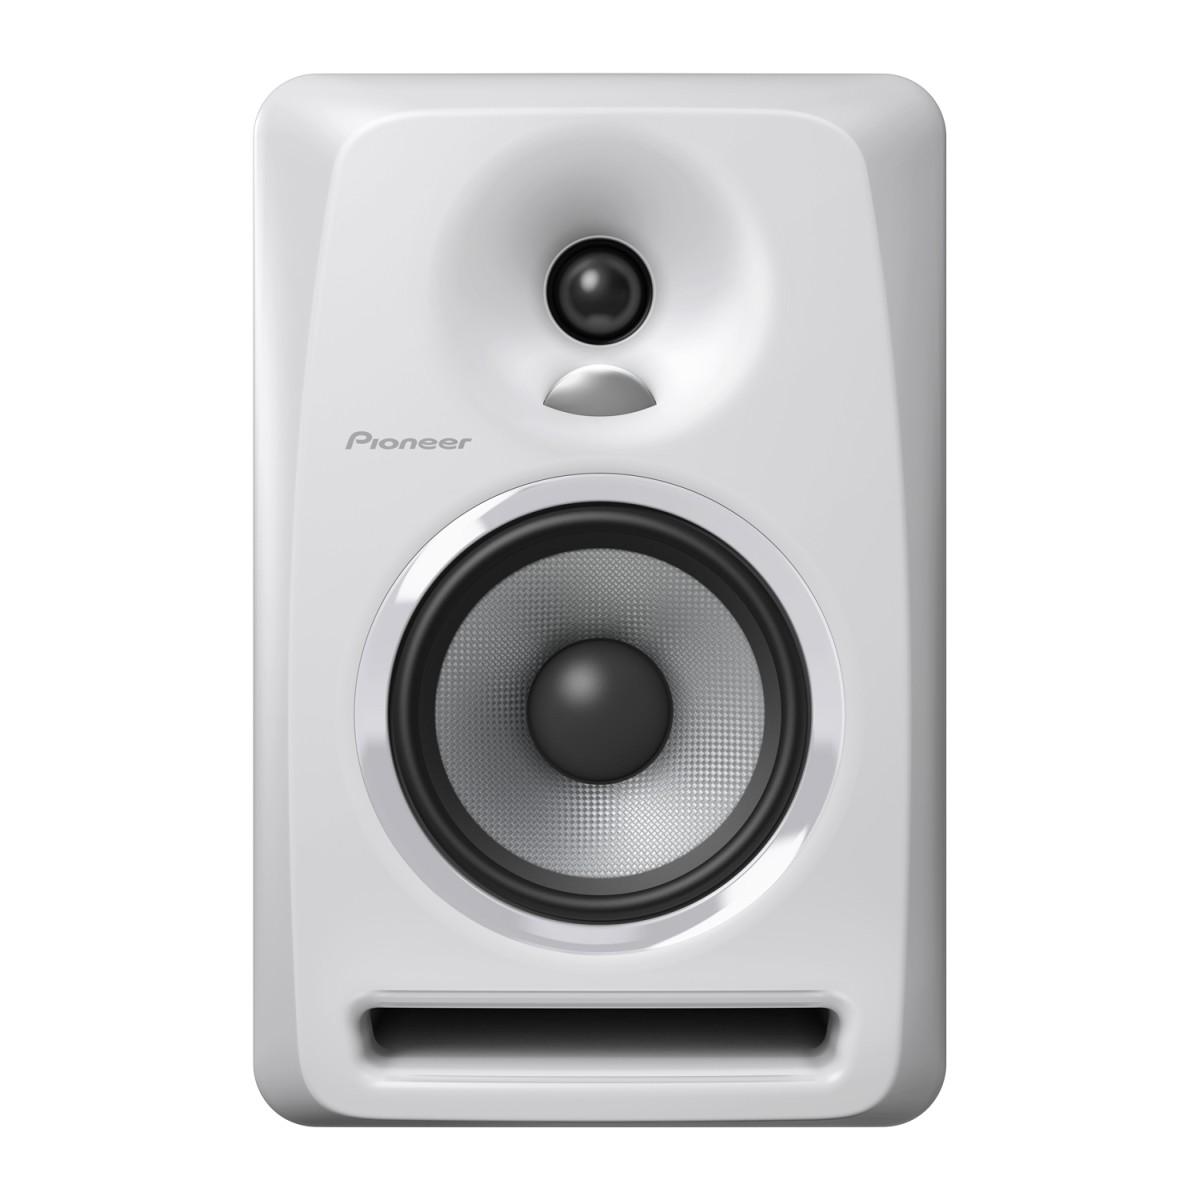 MONITOR SPEAKER PIONEER S-DJ50X-W 5